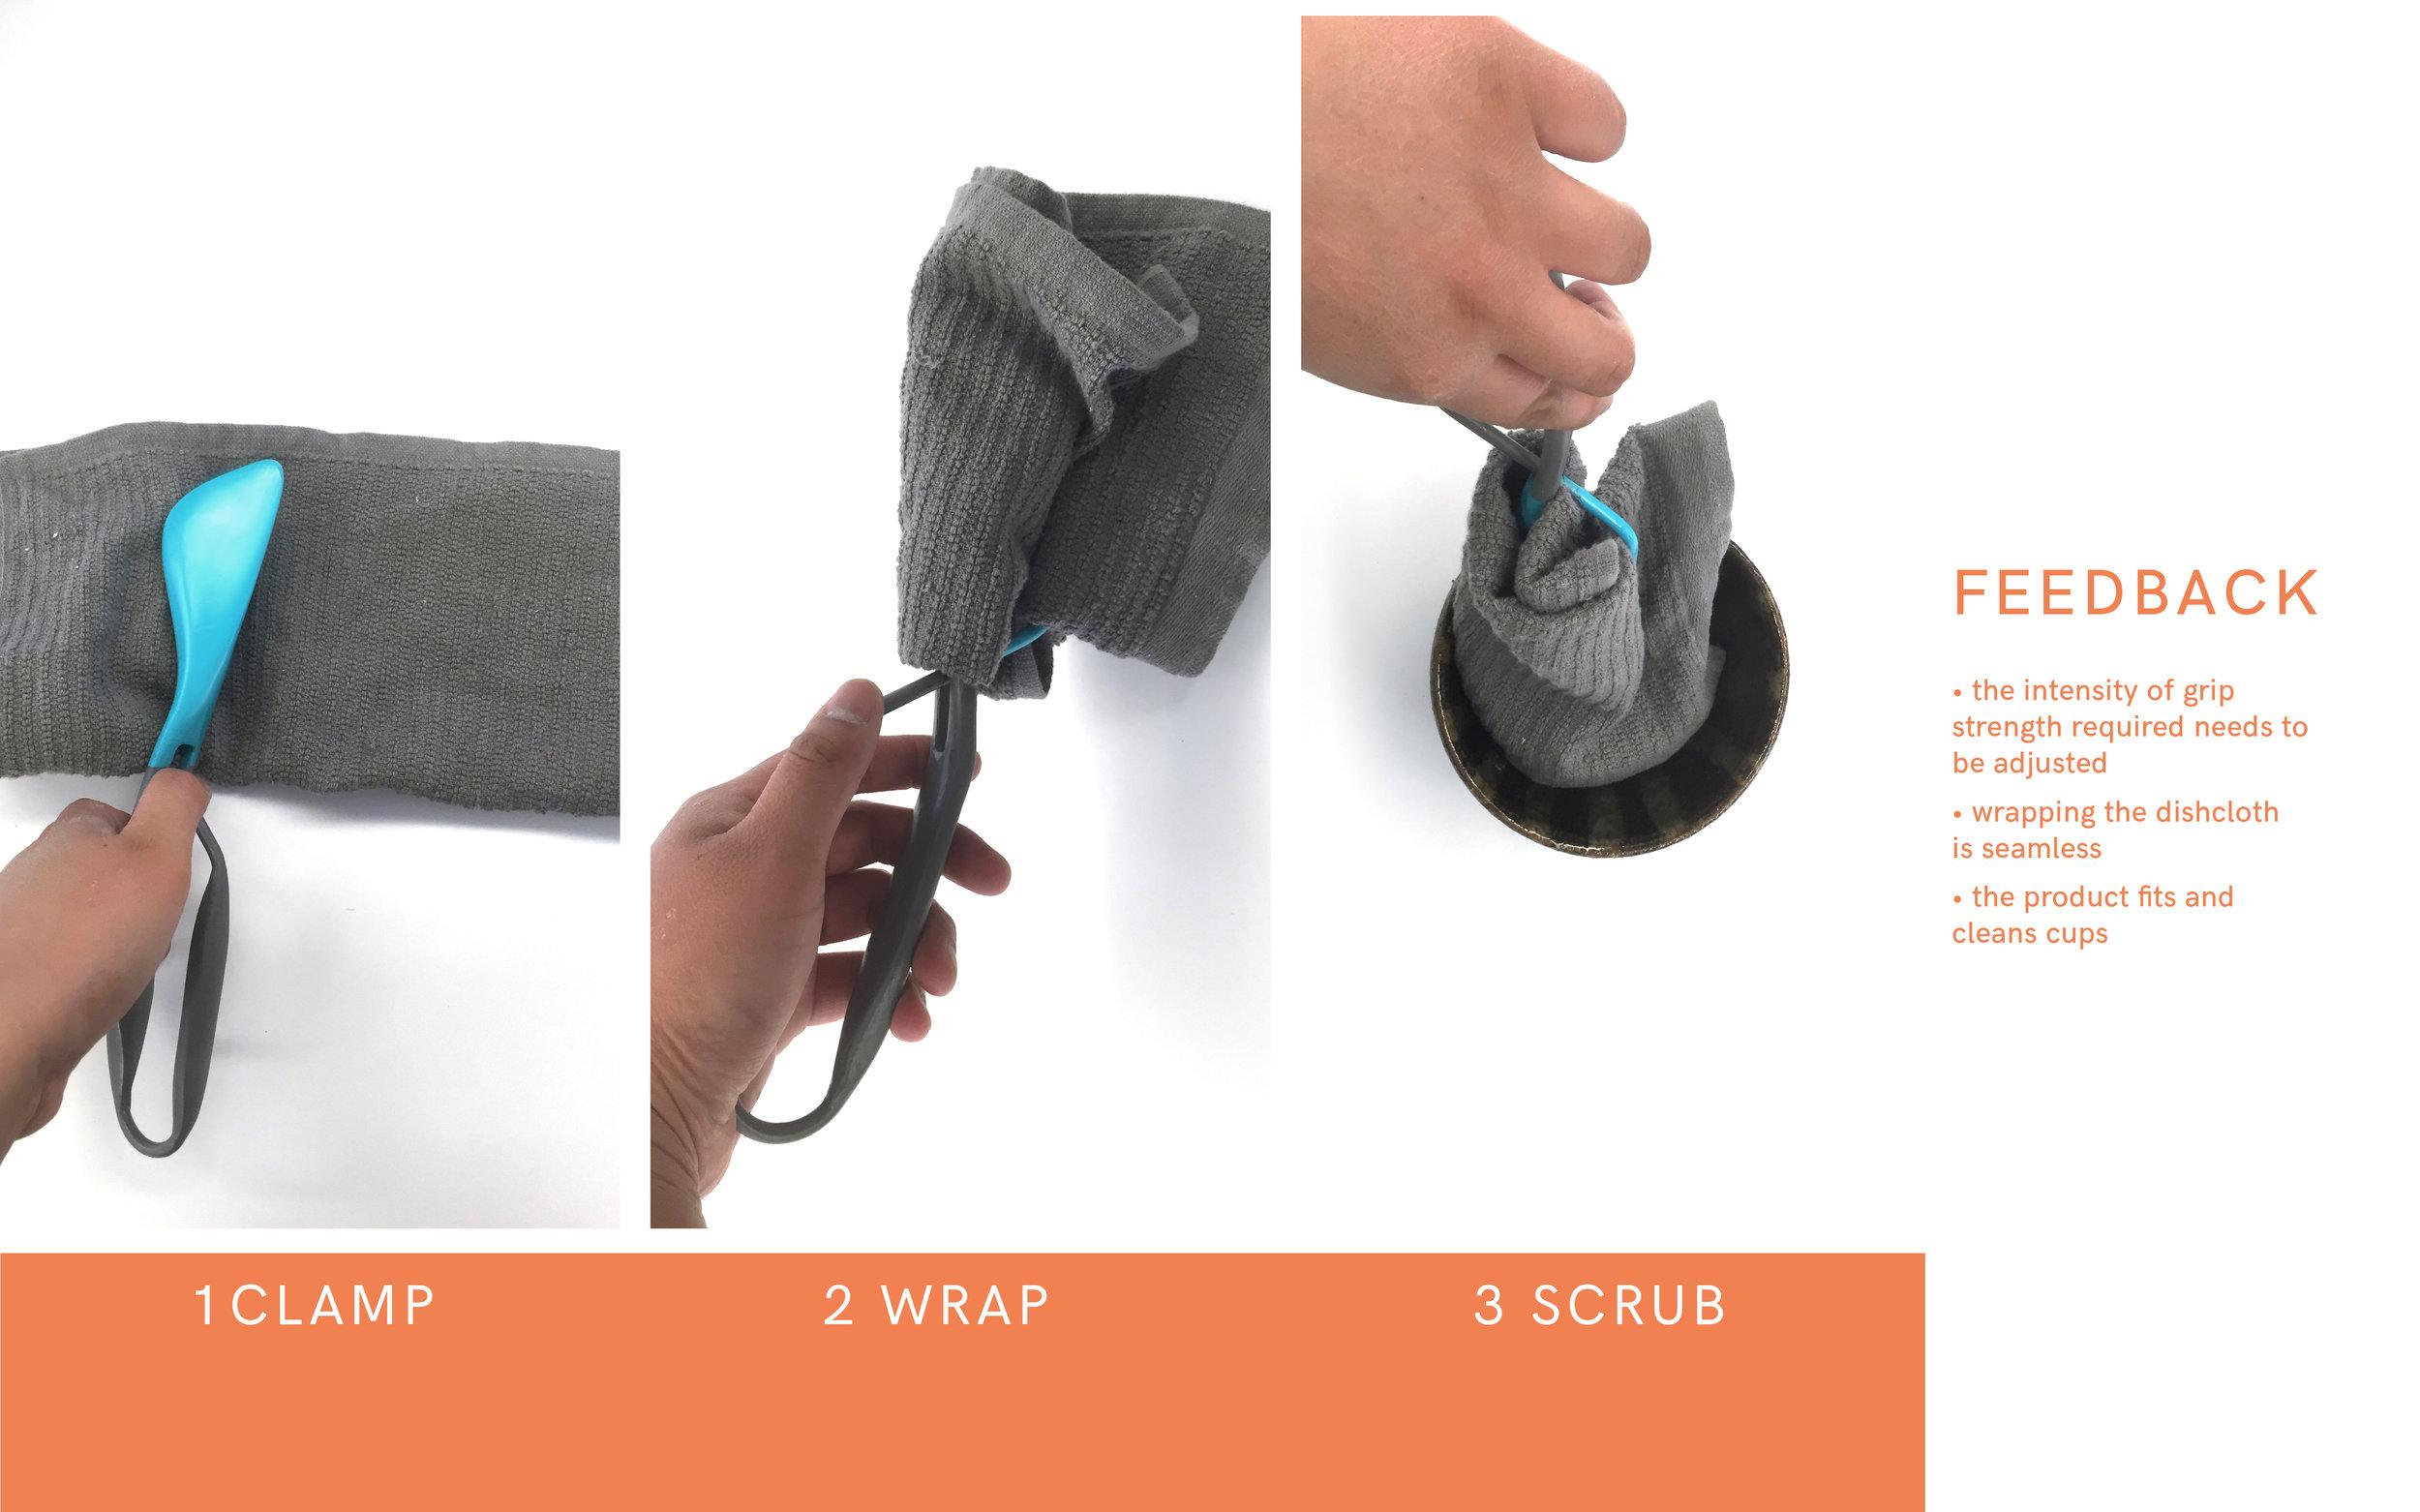 Portfolio-Clamp Dishcloth.V1E69.jpg